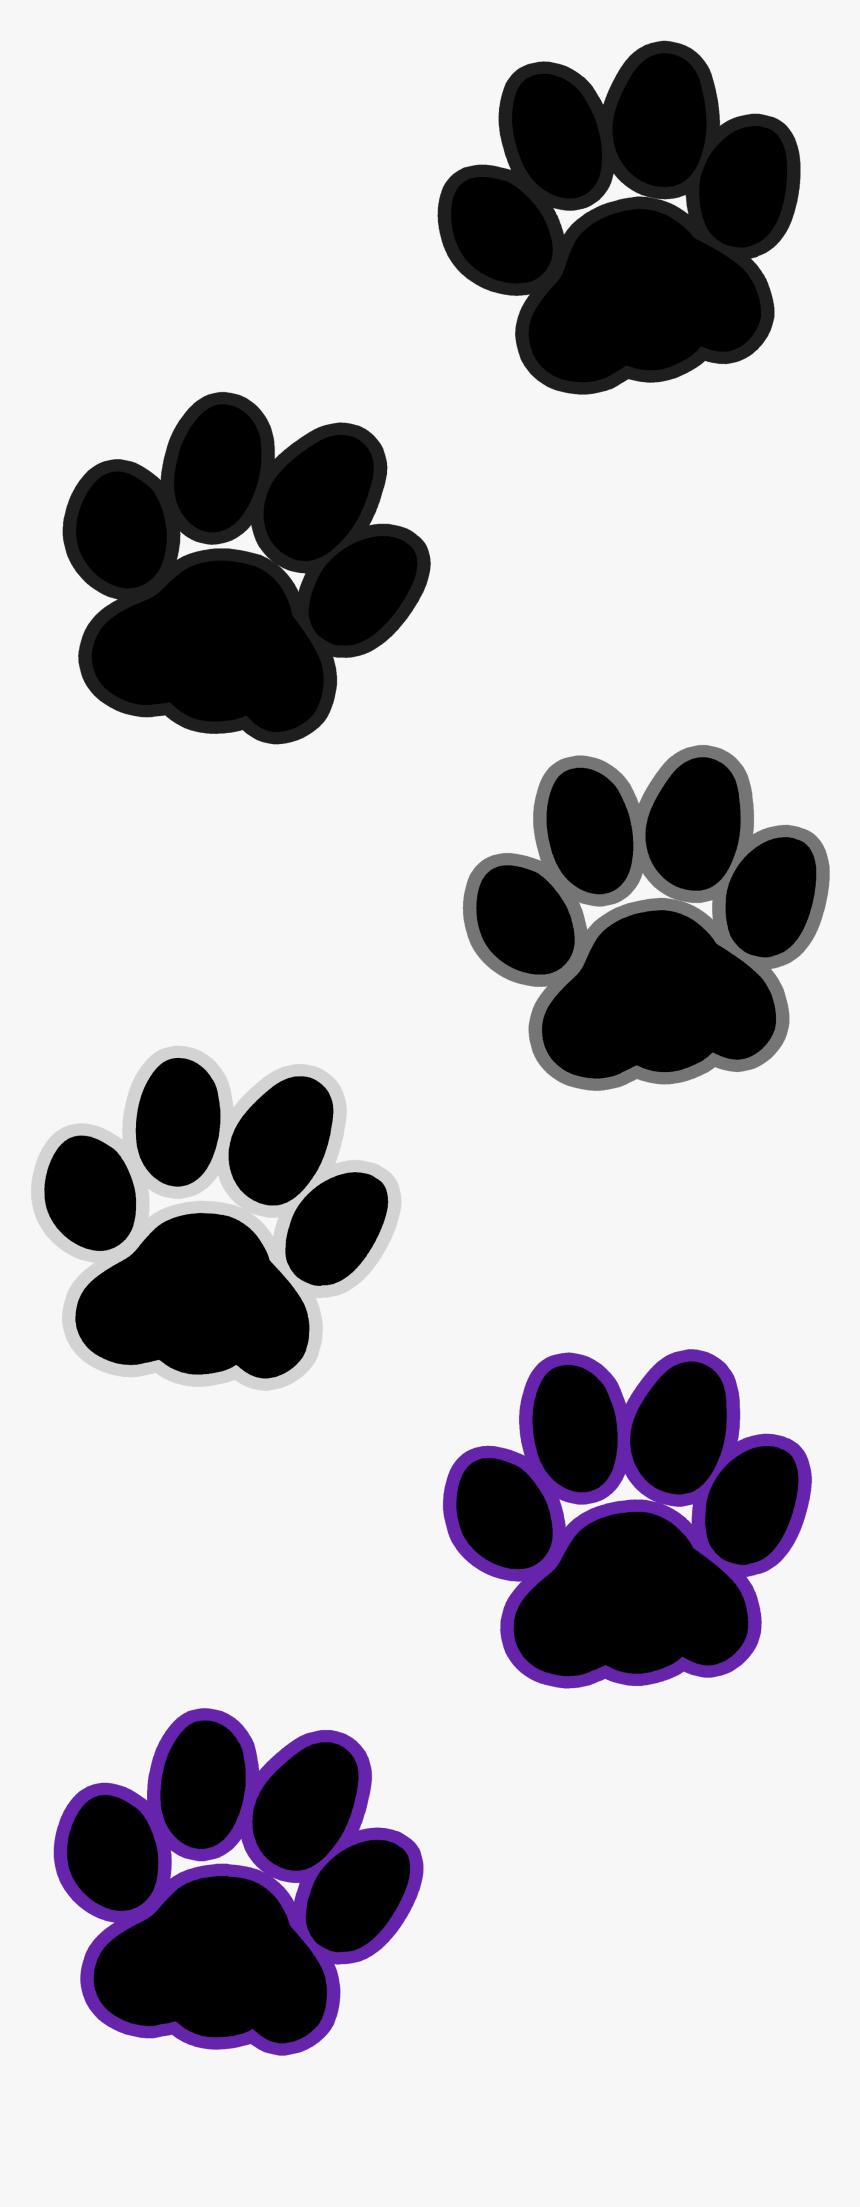 Dog Paw Print Png, Transparent Png, Free Download